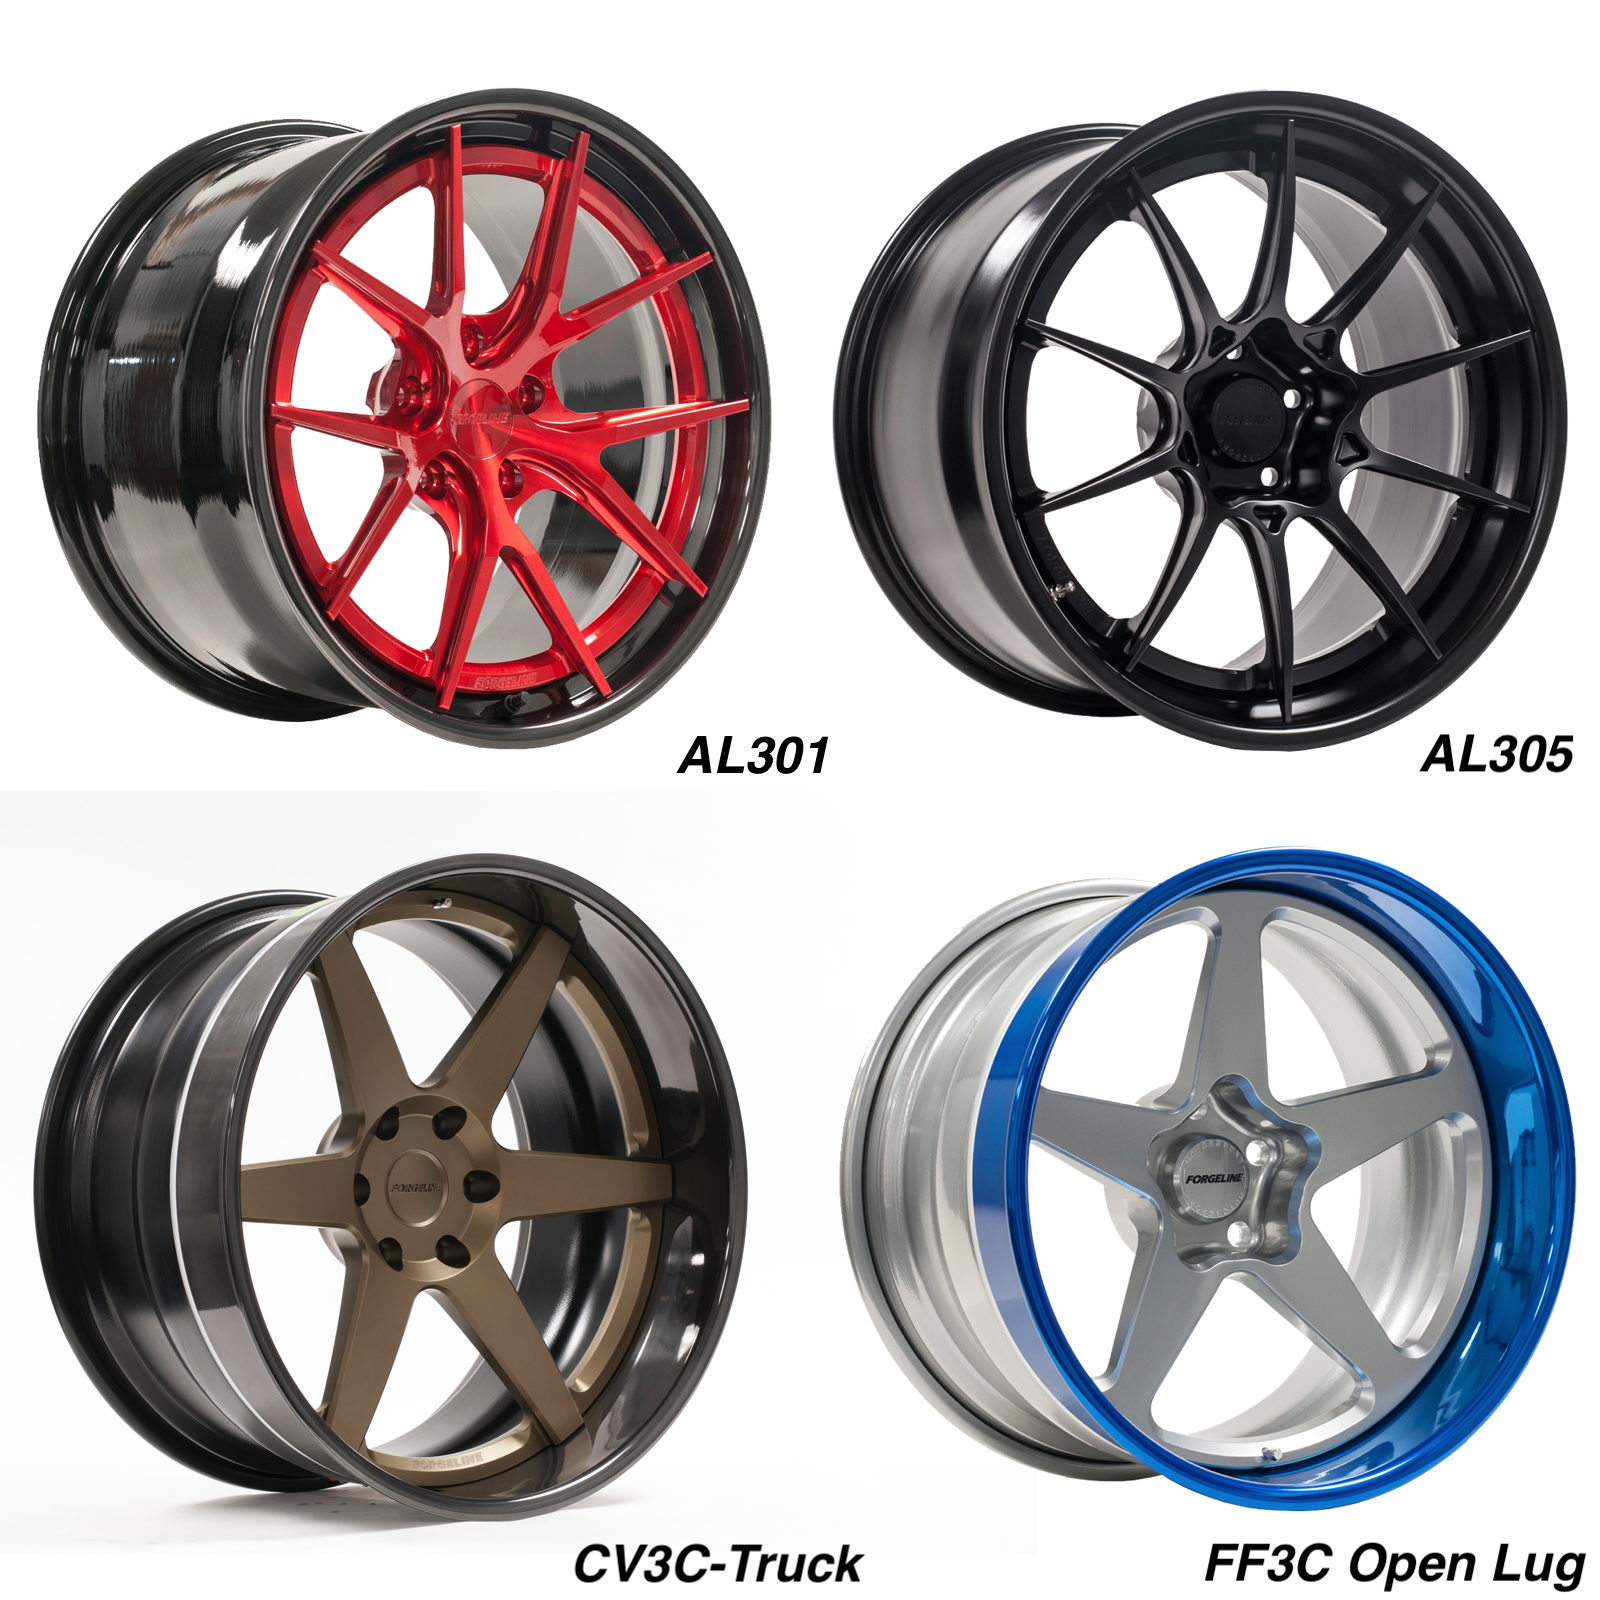 New Forgeline AL301, AL305, CV3C-Truck, and FF3C Open Lug Wheels